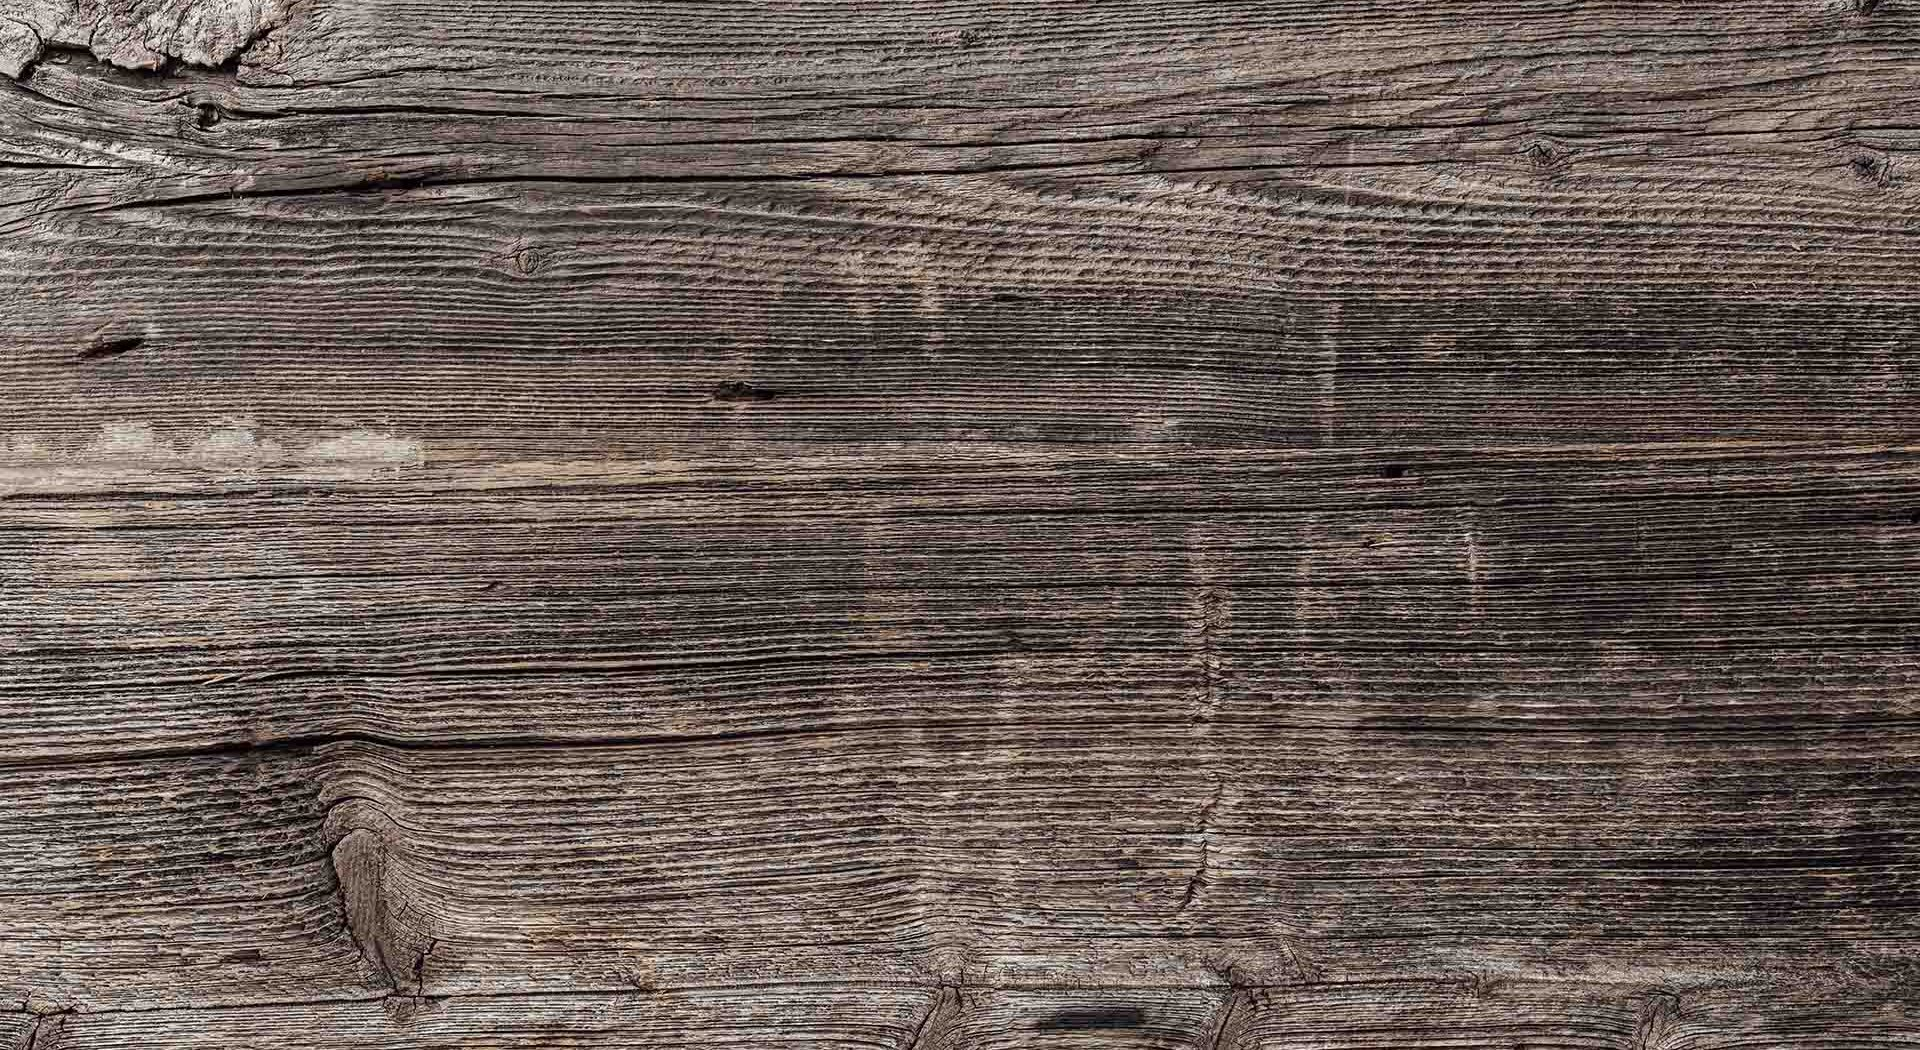 How do you take care of hardwood floors?